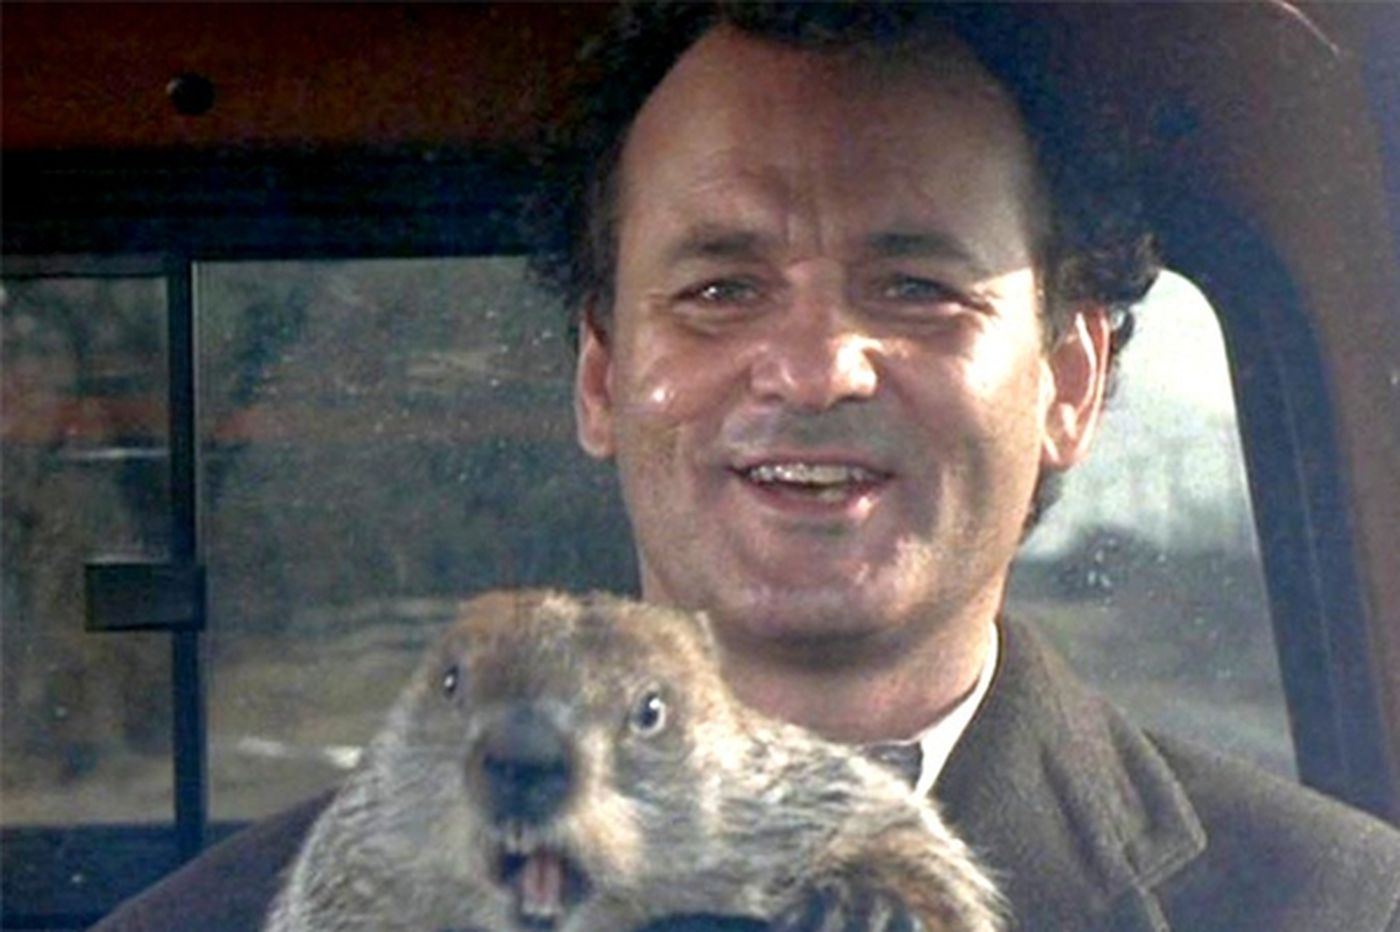 Groundhog Day - CORONACHRISTIAN13